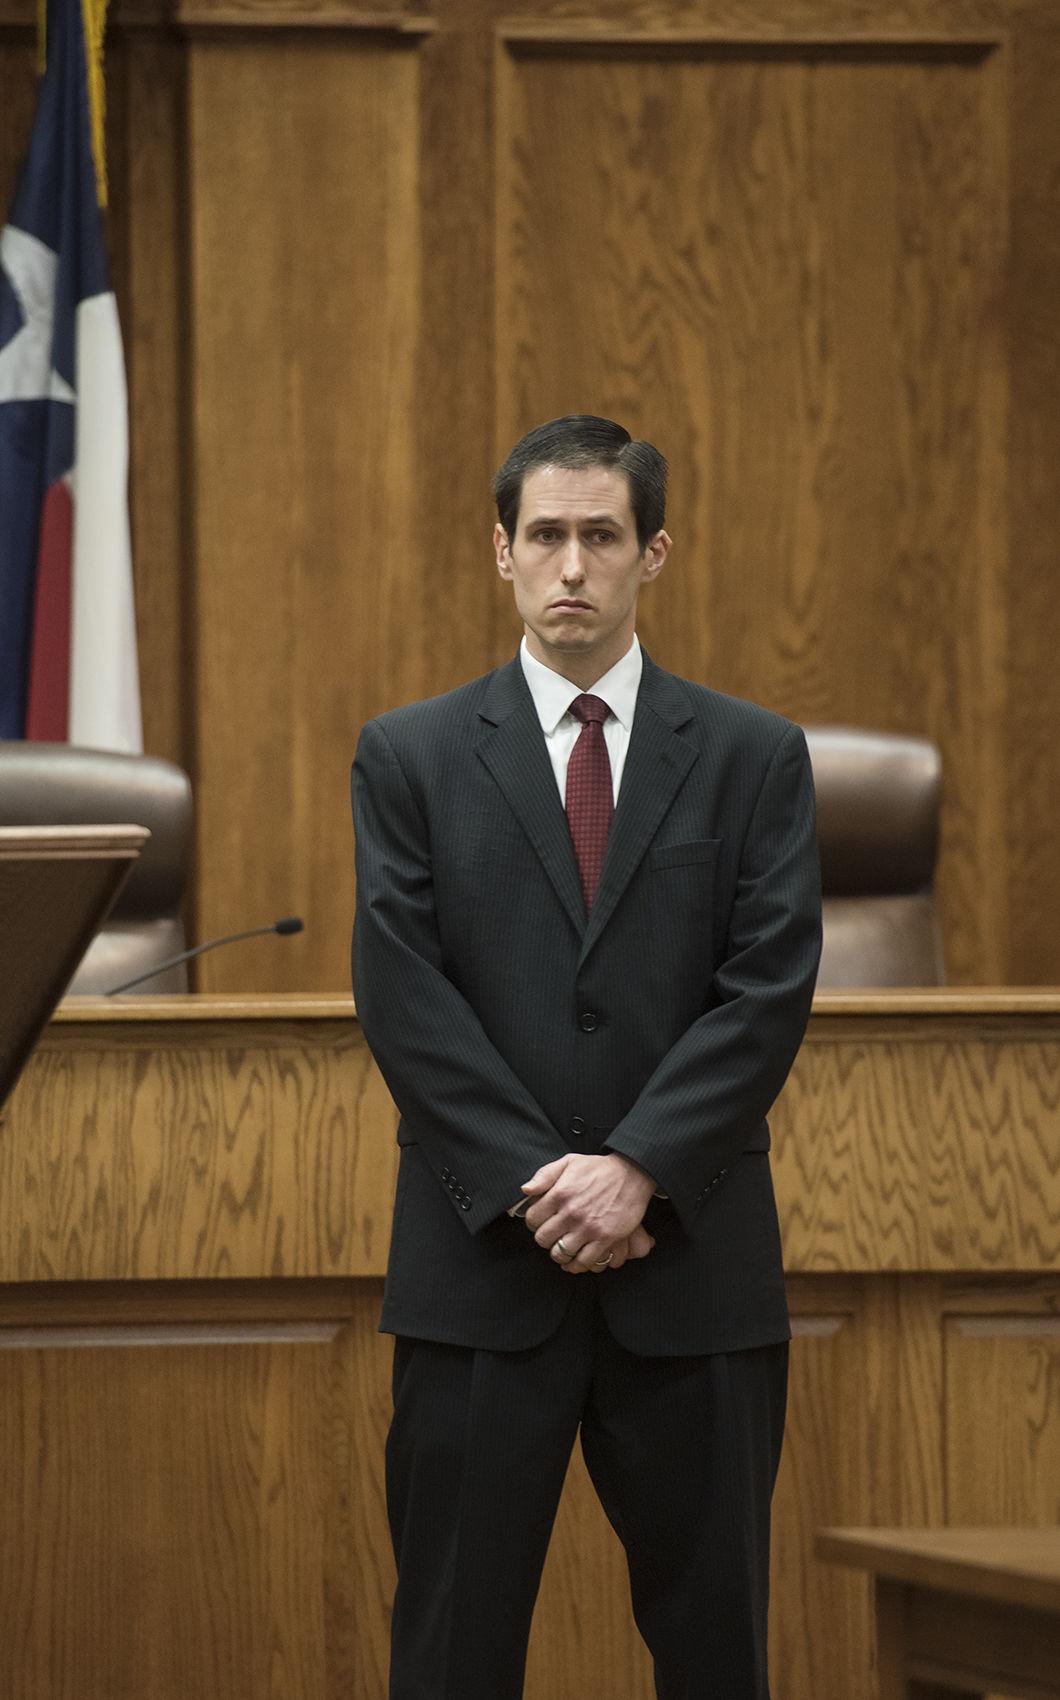 Smith County Prosecutor Da Candidate Jacob Putman